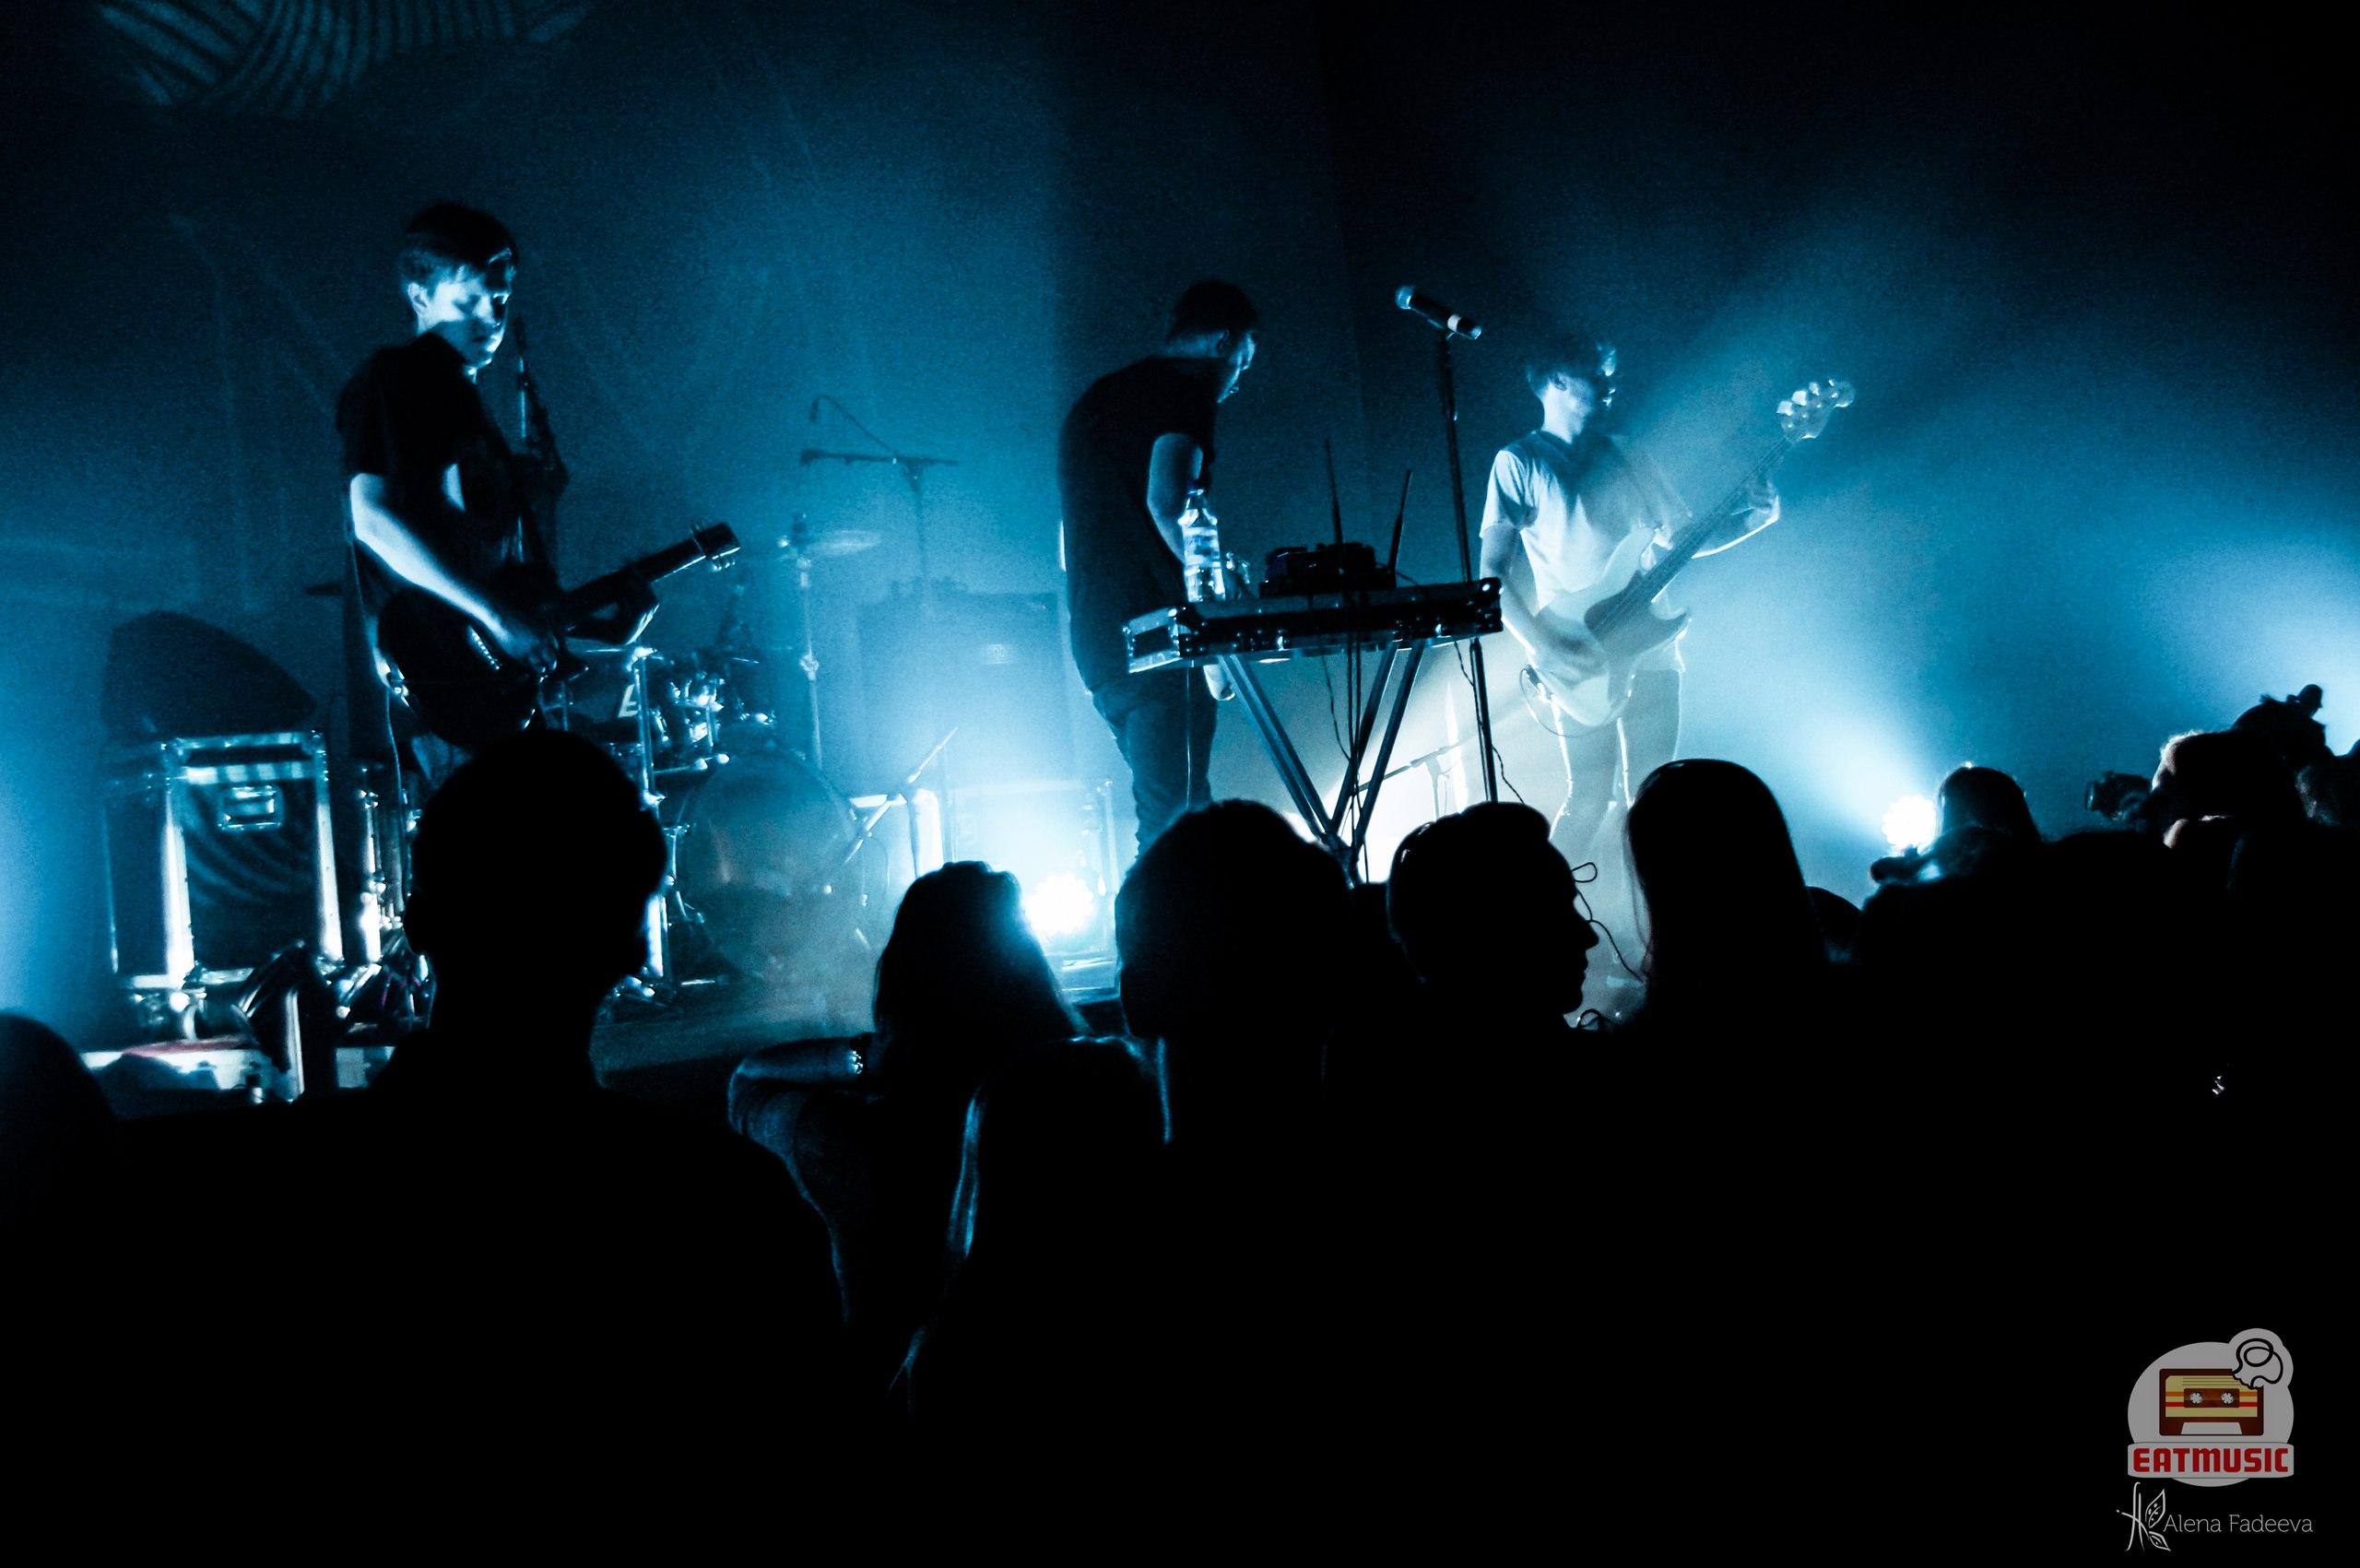 Концерт VLNY + VIDEATAPE @ Эрарта (СПб) Фотограф - Алена Фадеева